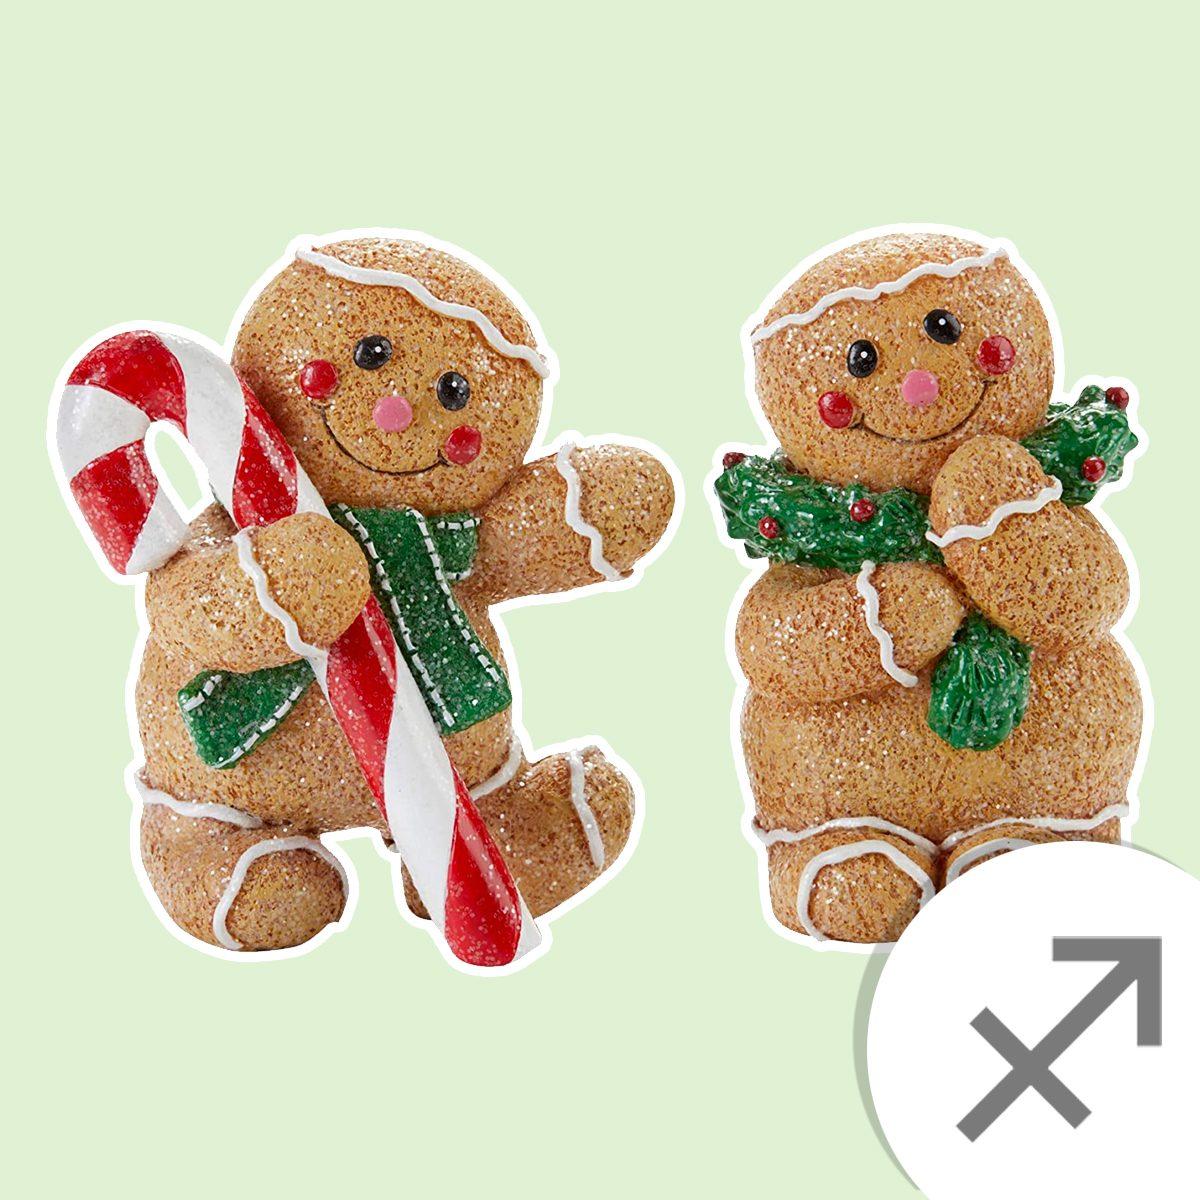 tabletop gingerbread figurines